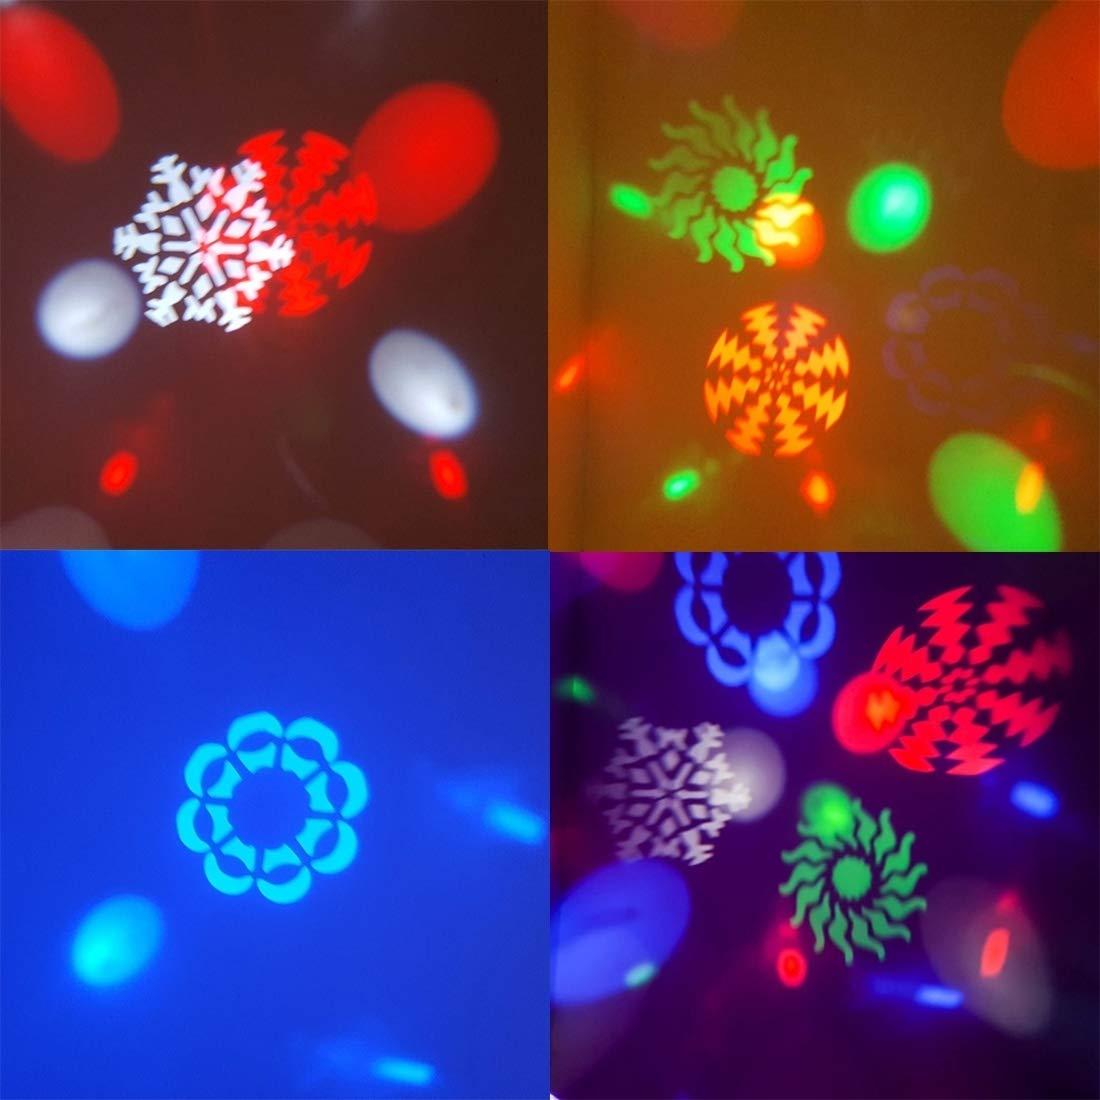 stage lighting 30W Mushroom Magic Ball LED Crystal Light, Master/Slave / DMX512 / Auto Run/Sound Control Modes, AC 220V by stage lighting (Image #7)